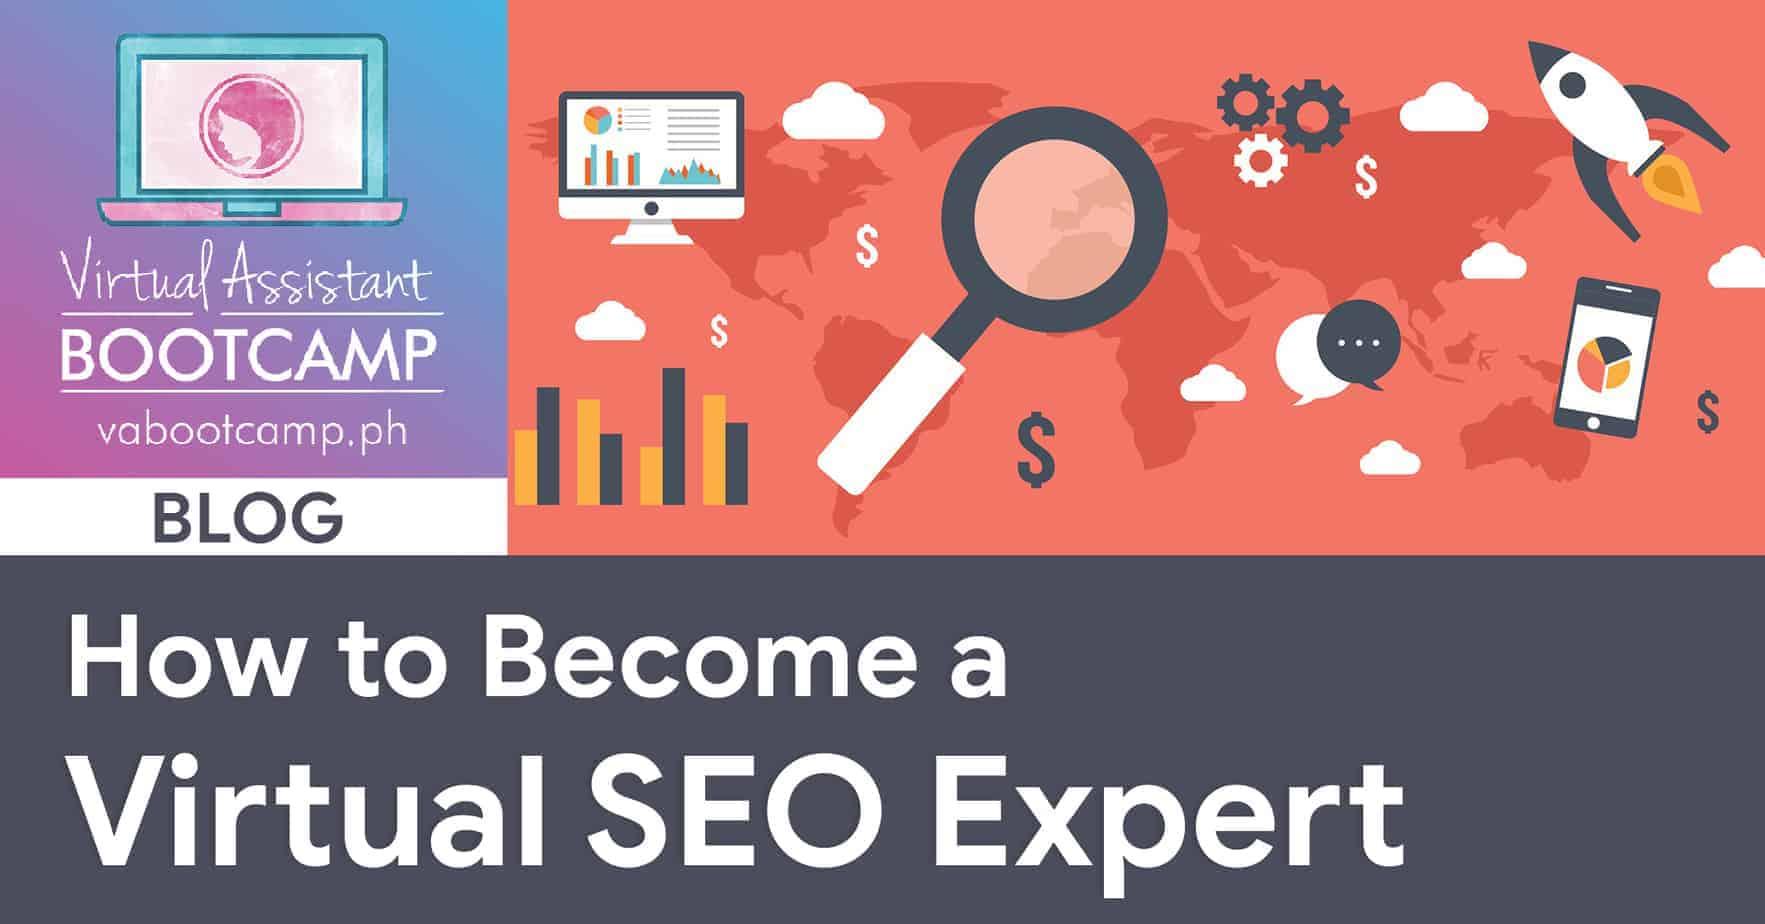 How to Become a Virtual SEO Expert